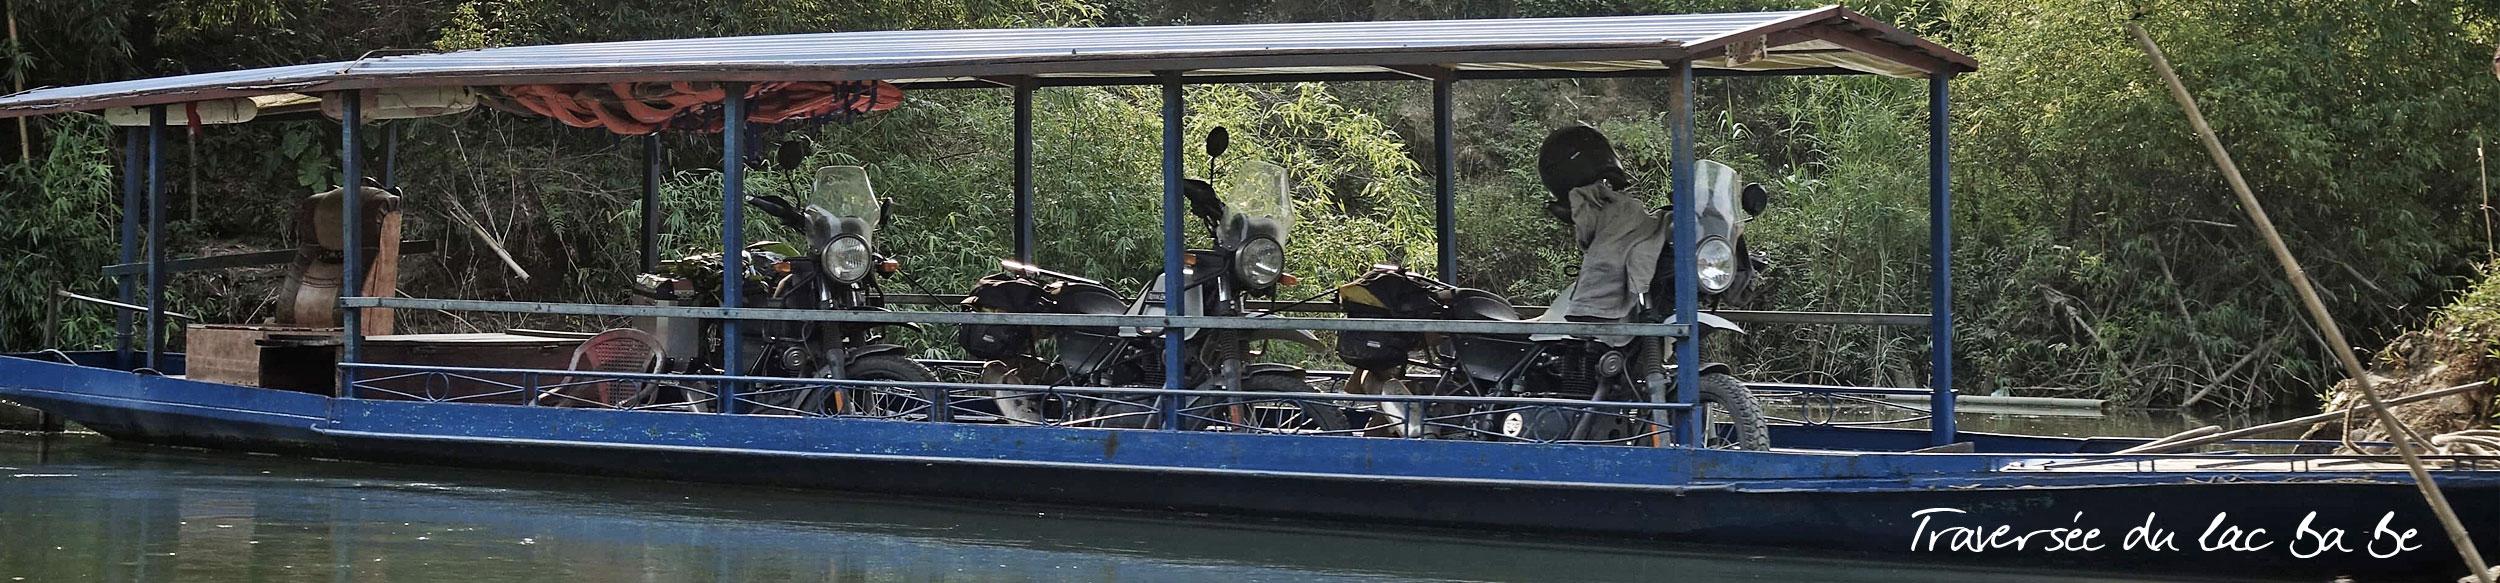 Nos motos royal enfield himalayan traversent le lac ba be au Vietnam